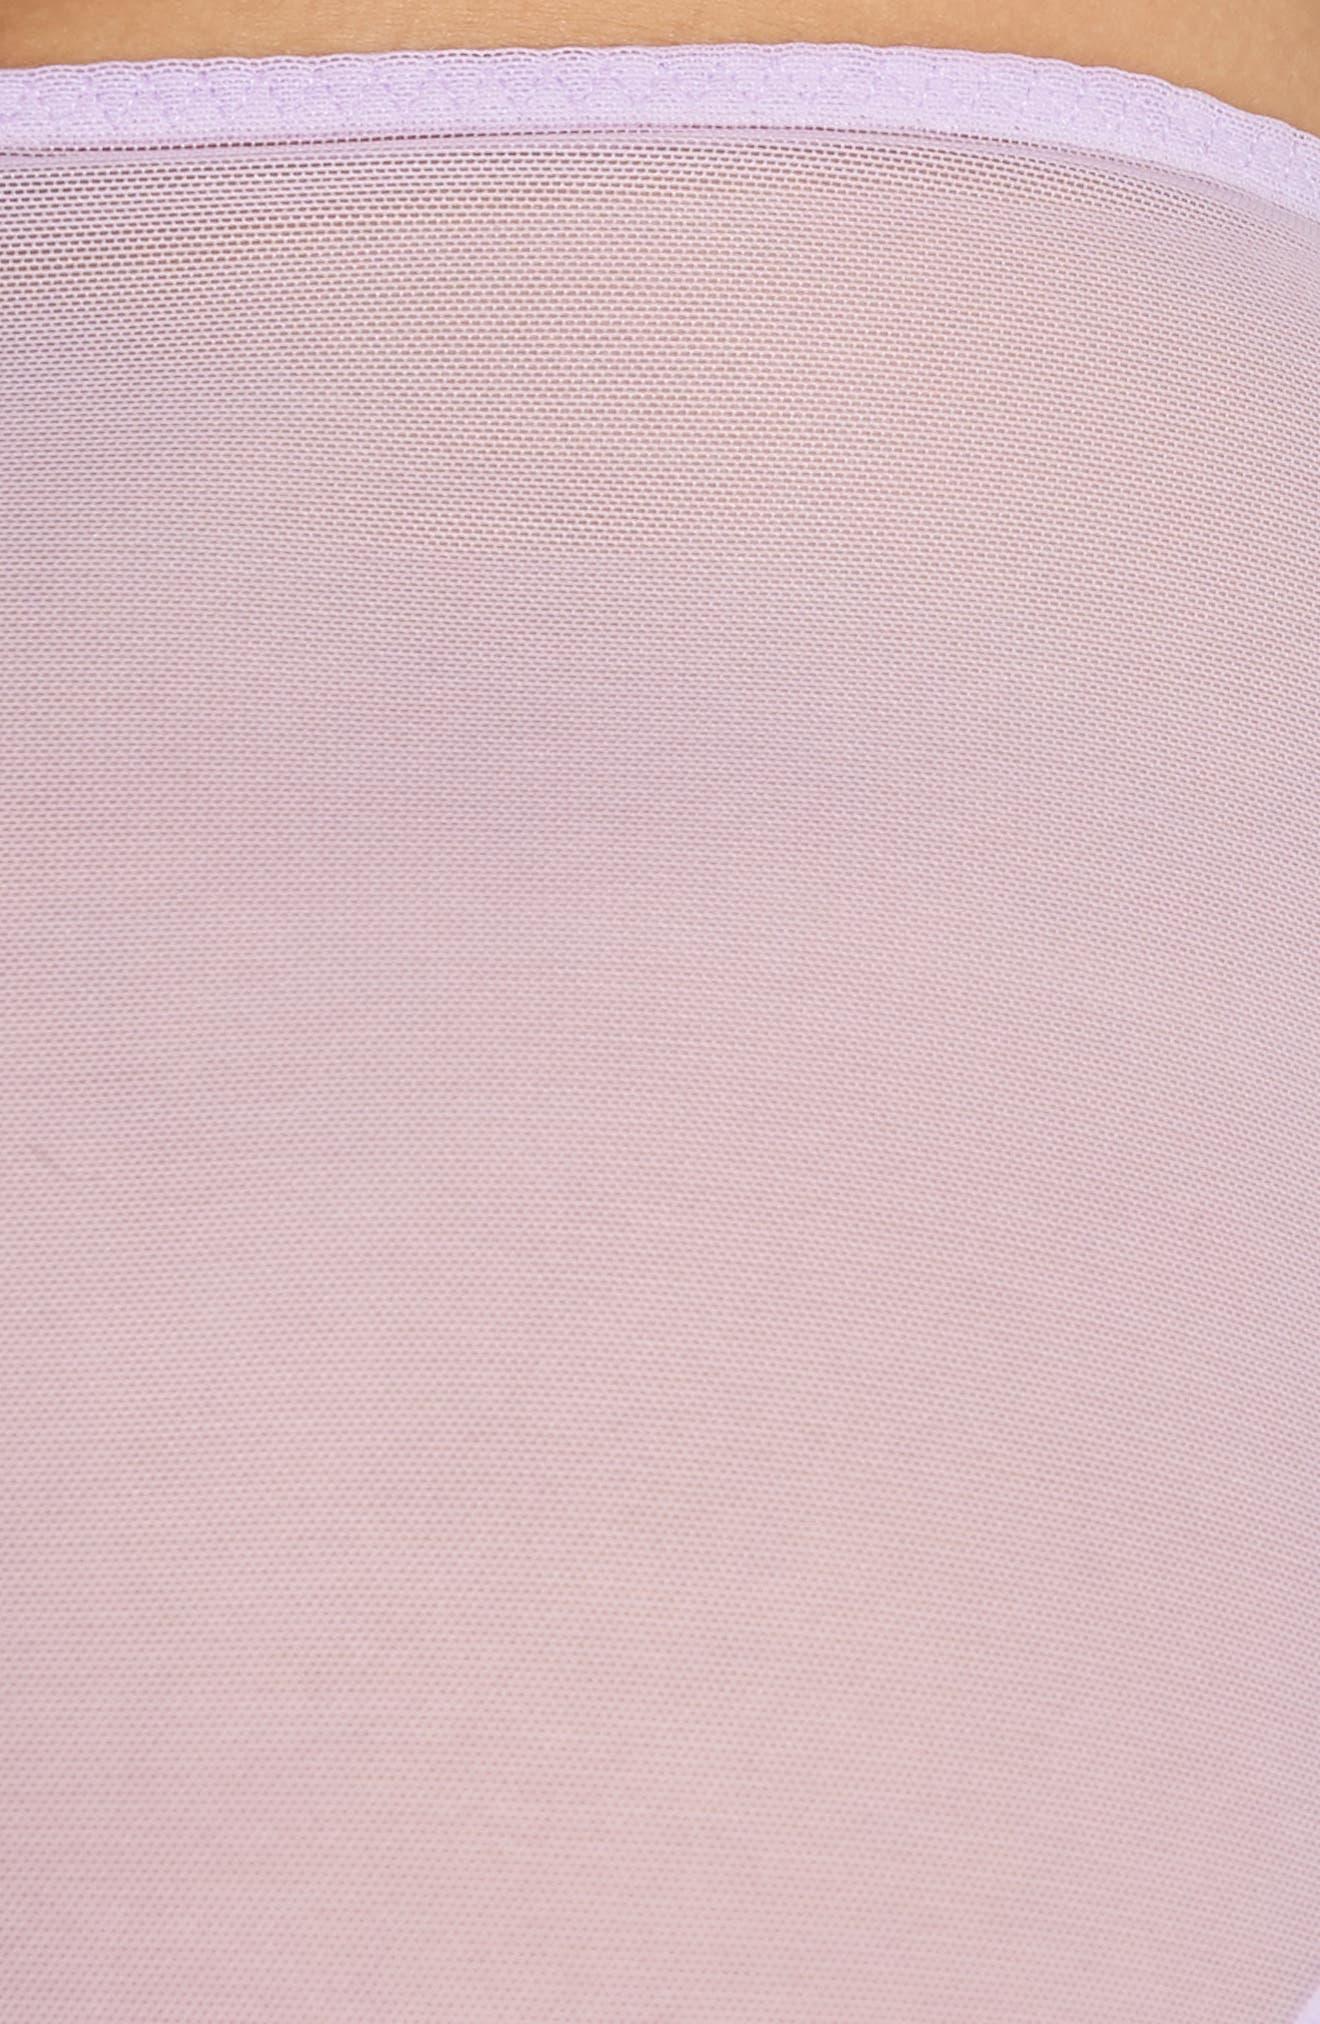 High Cut Briefs,                             Alternate thumbnail 9, color,                             Lavender